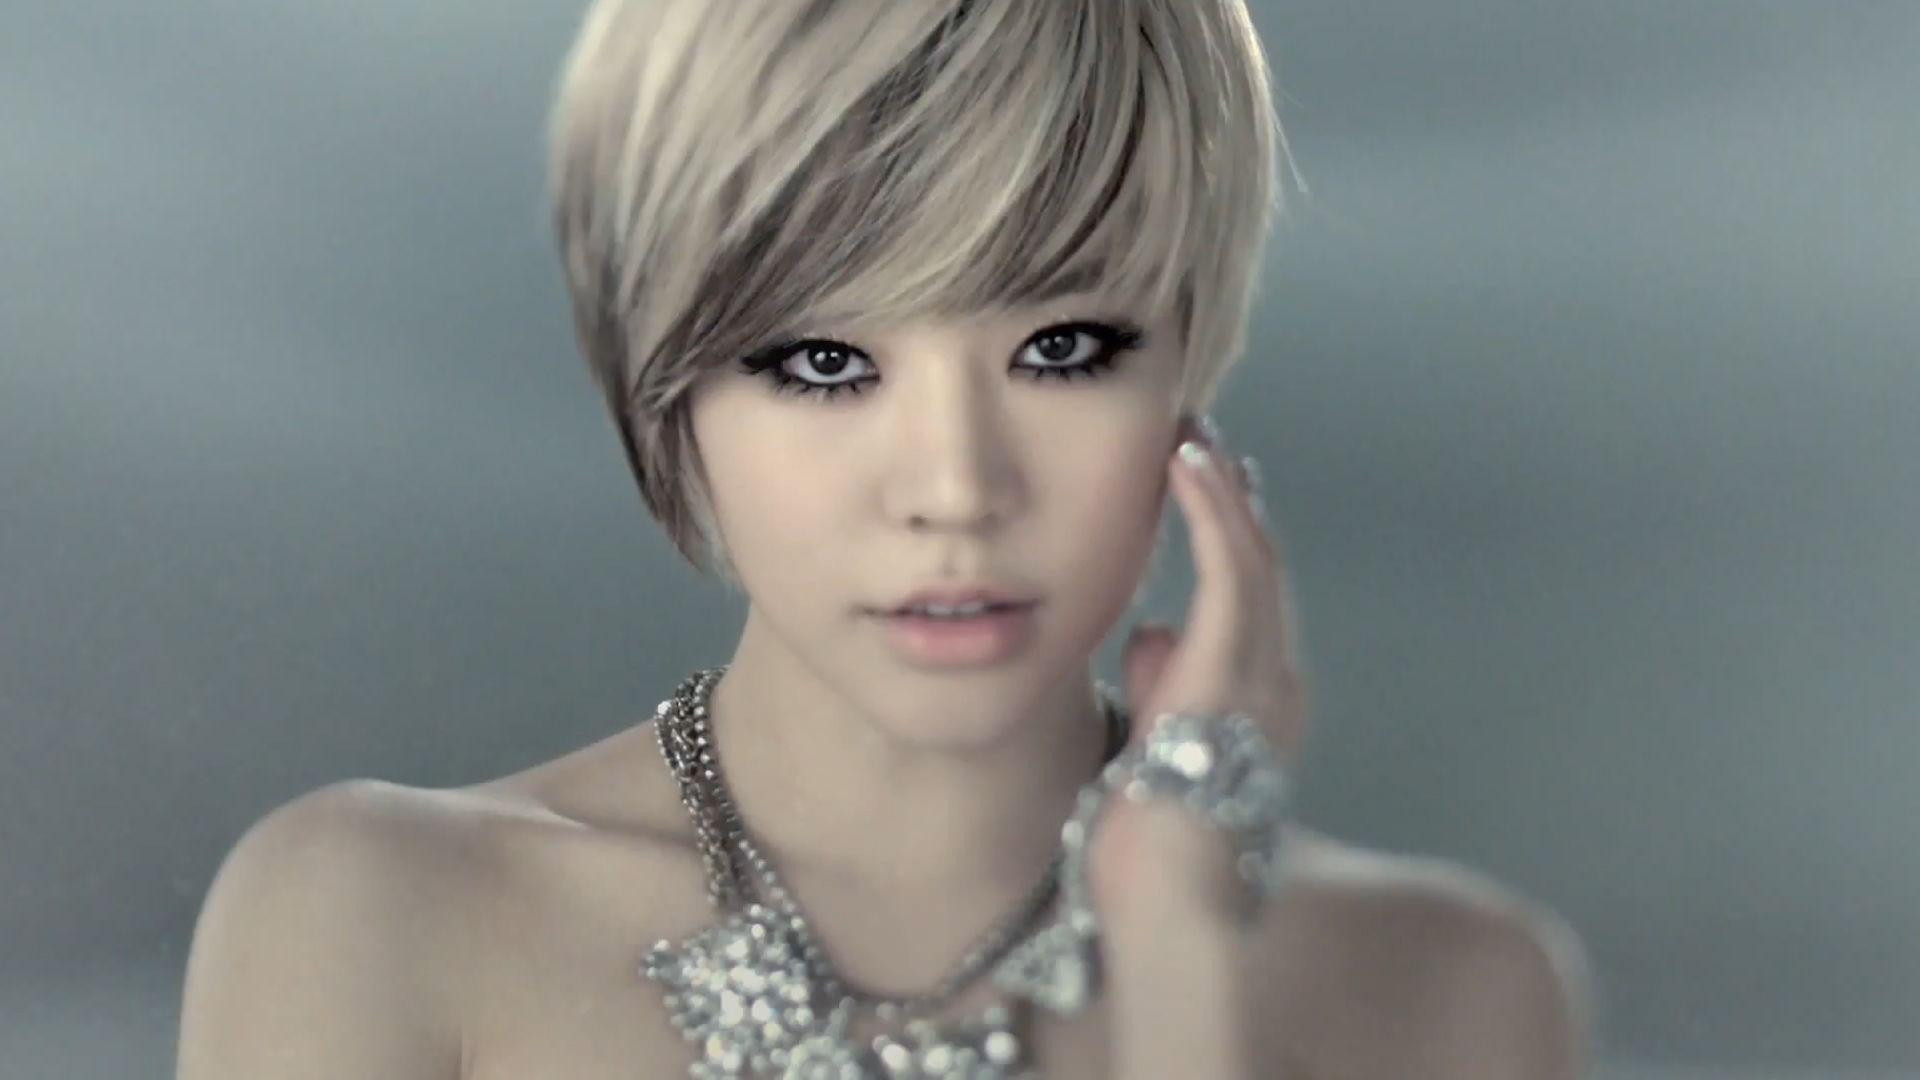 women Girls Generation SNSD short hair Asians Korean K Pop Lee Soon